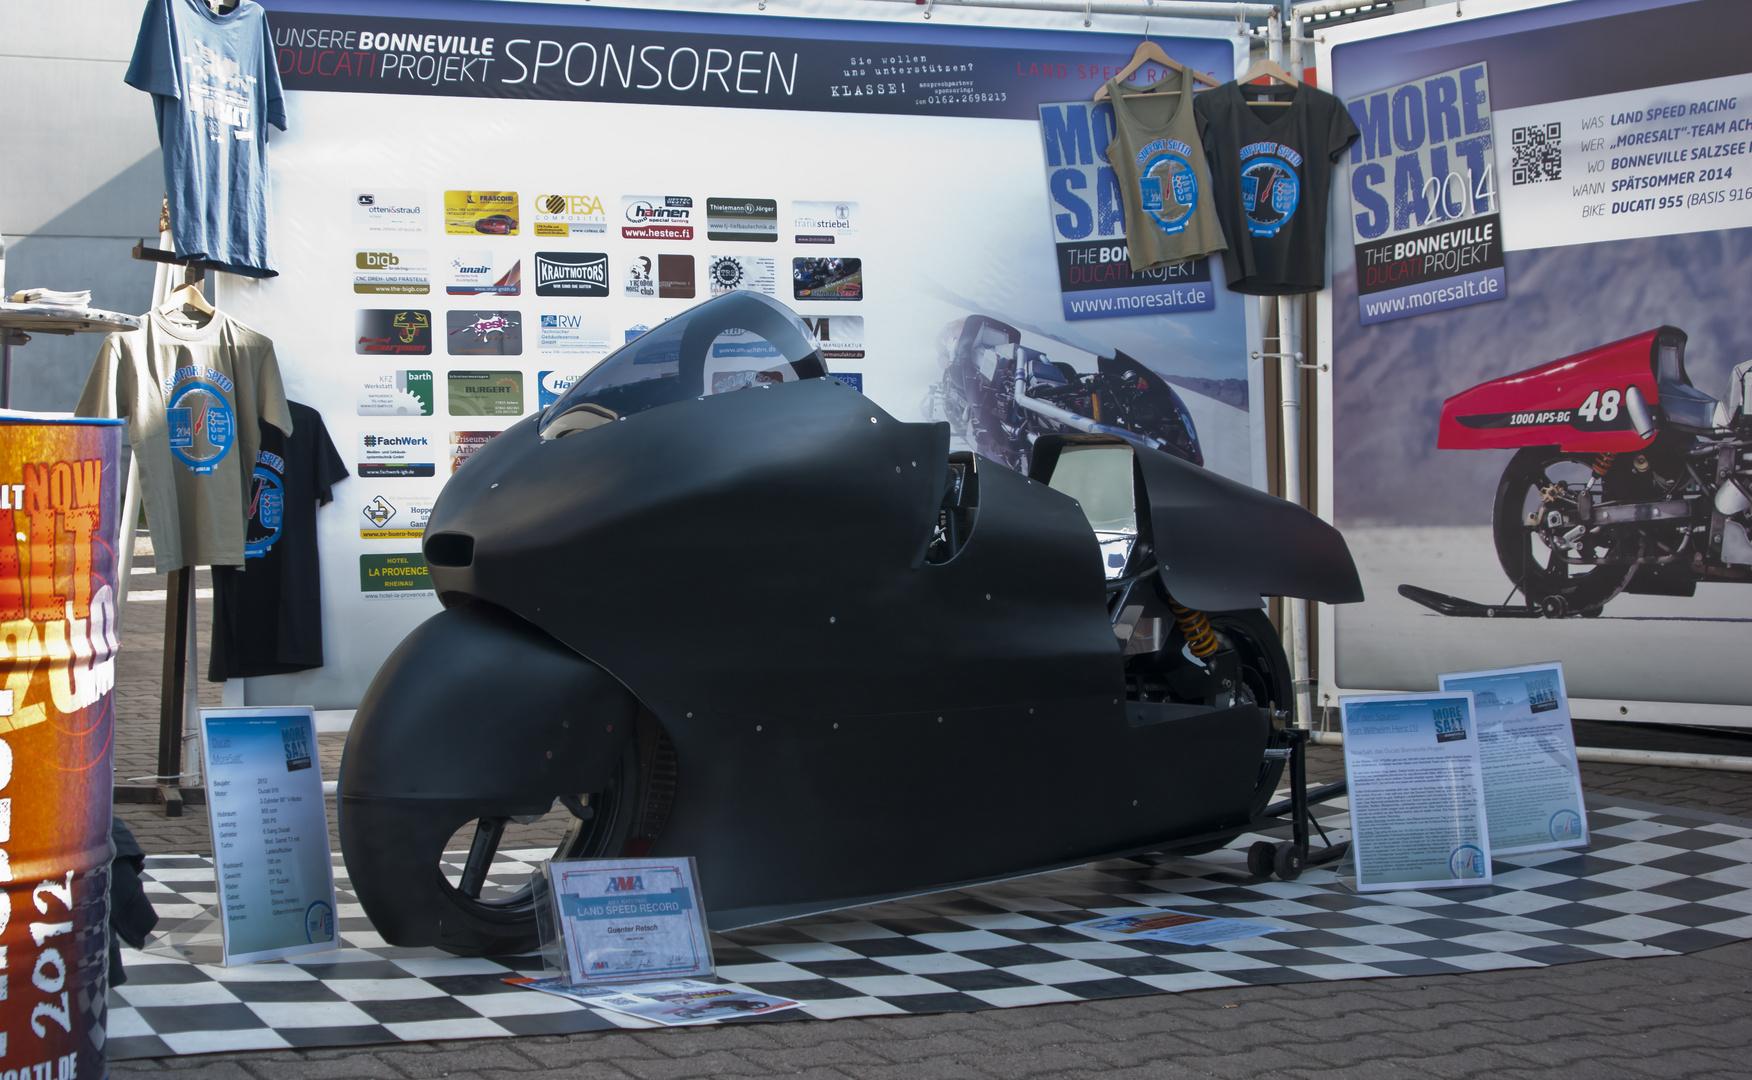 Bonneville Ducati Projekt 2014